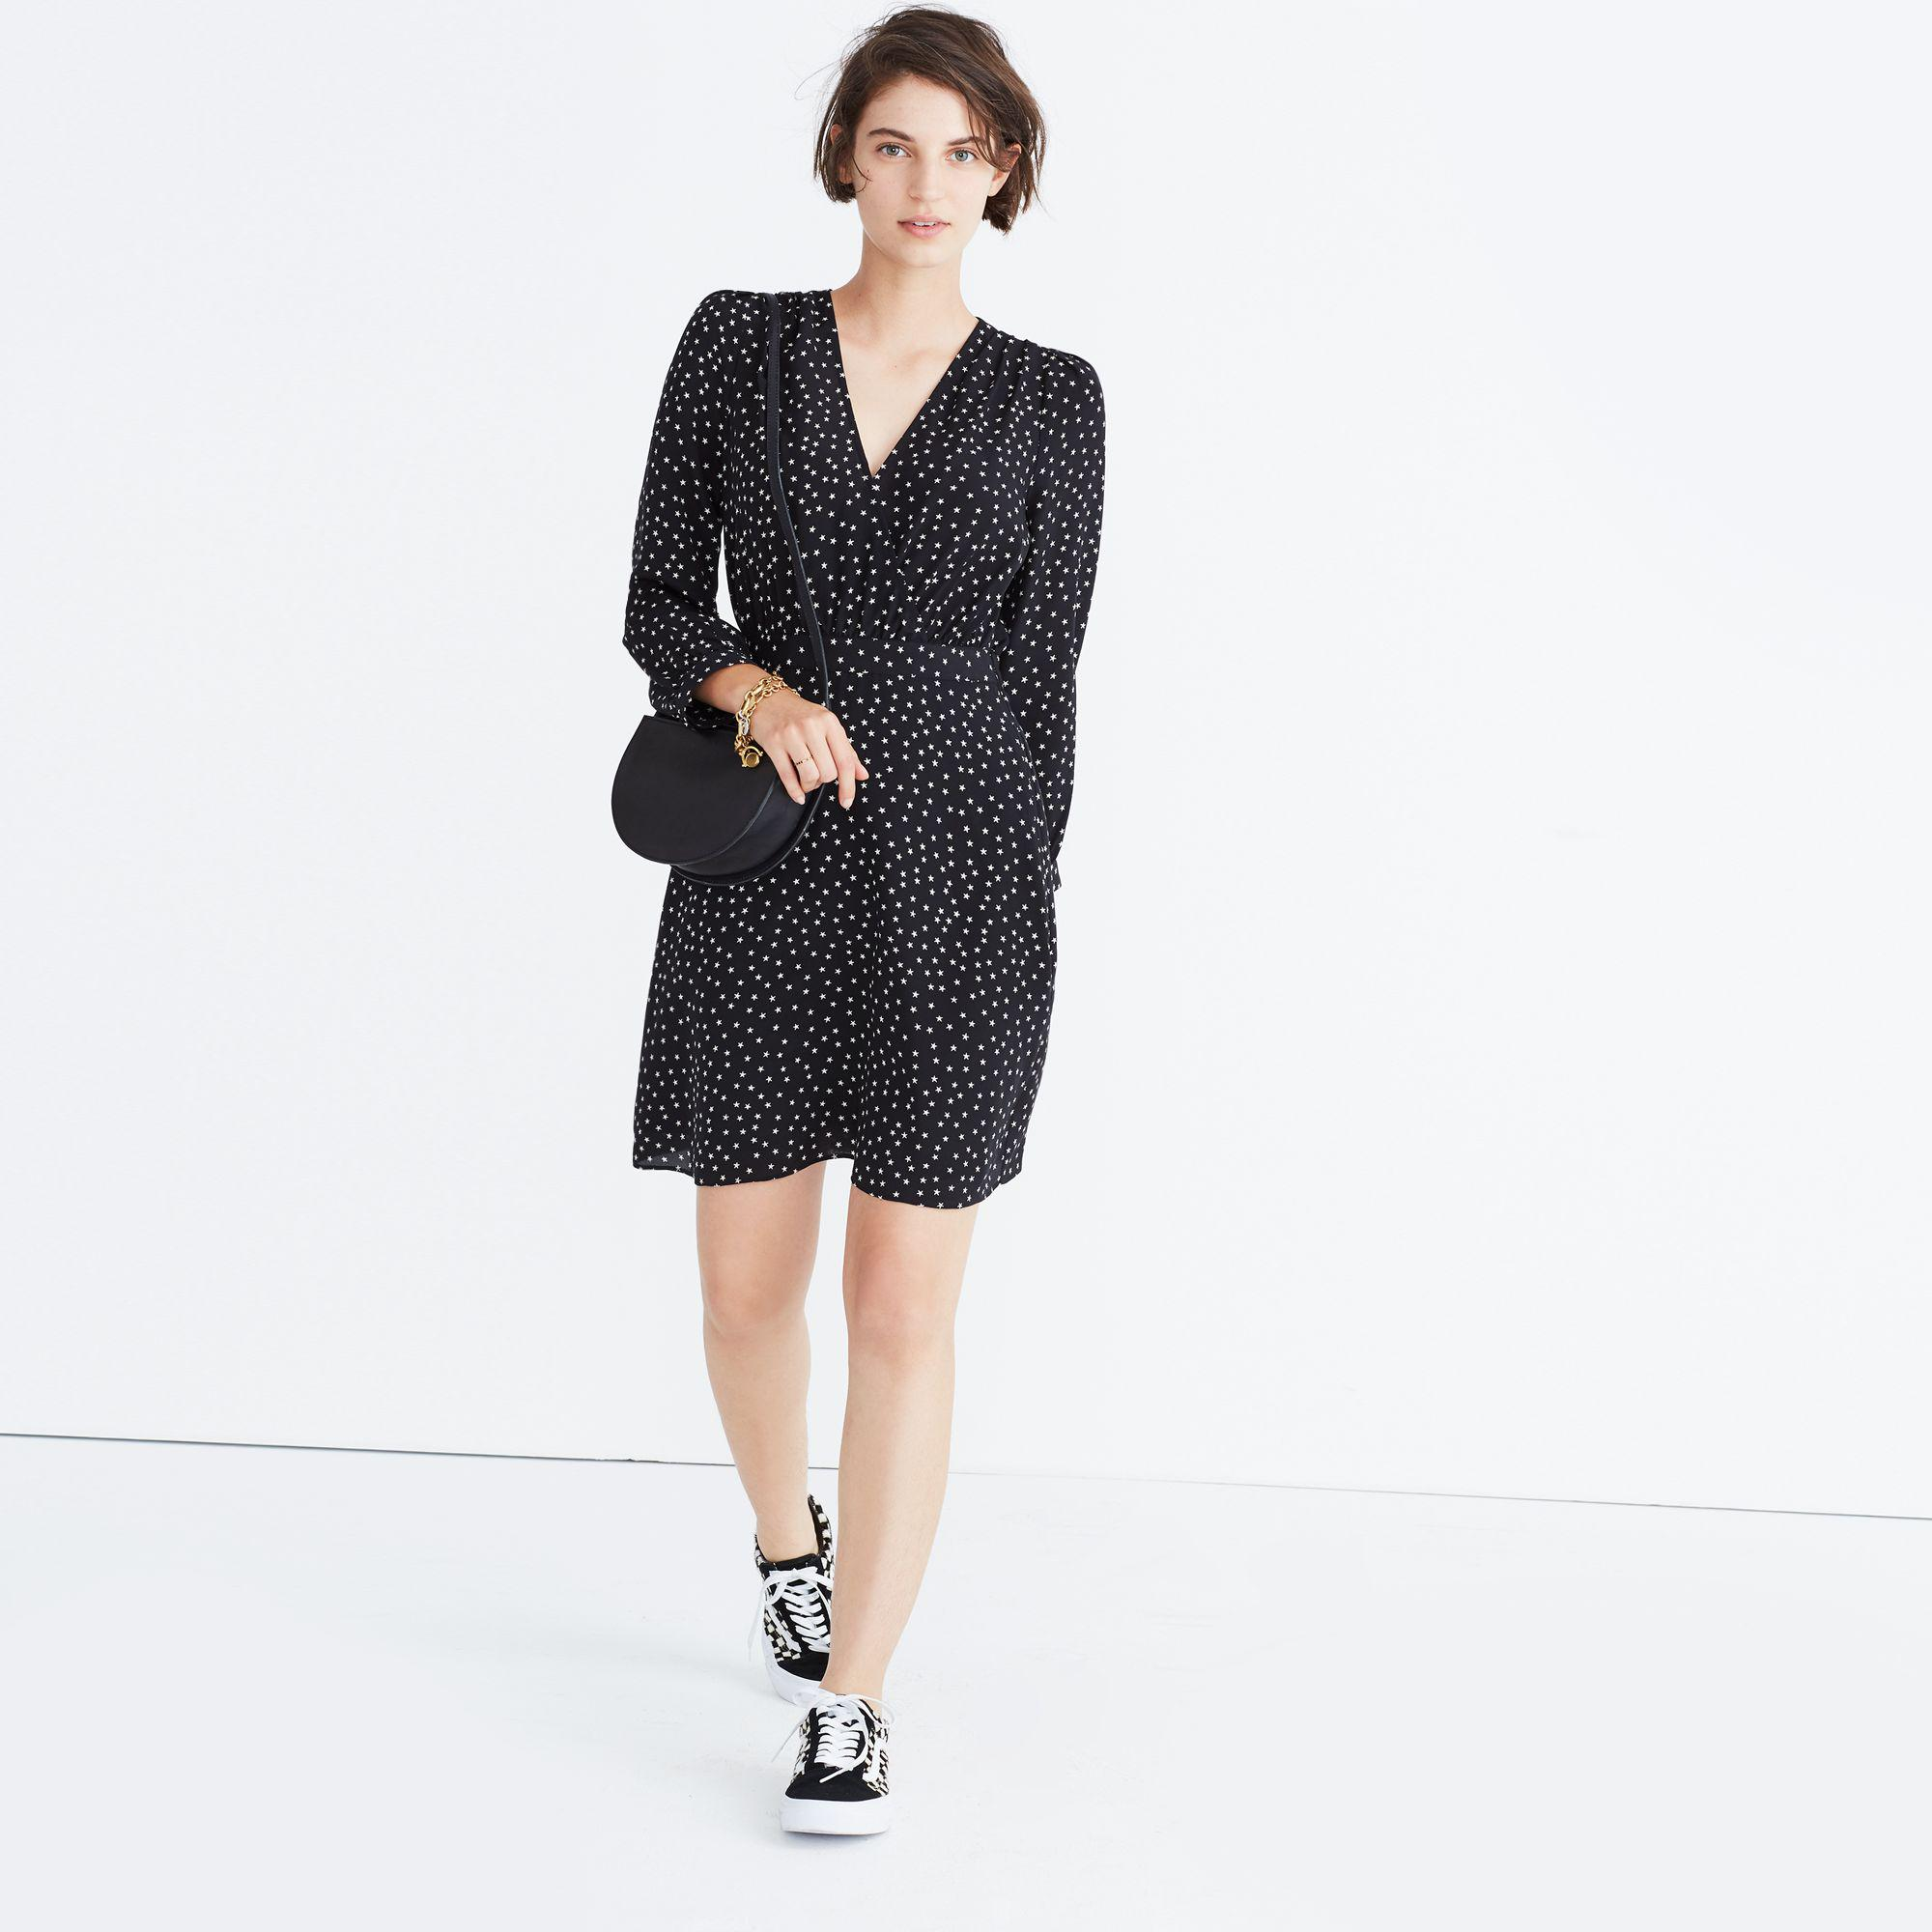 e31a02a64d9d5 Lyst - Madewell Silk Wrap-neckline Dress In Star Scatter in Black